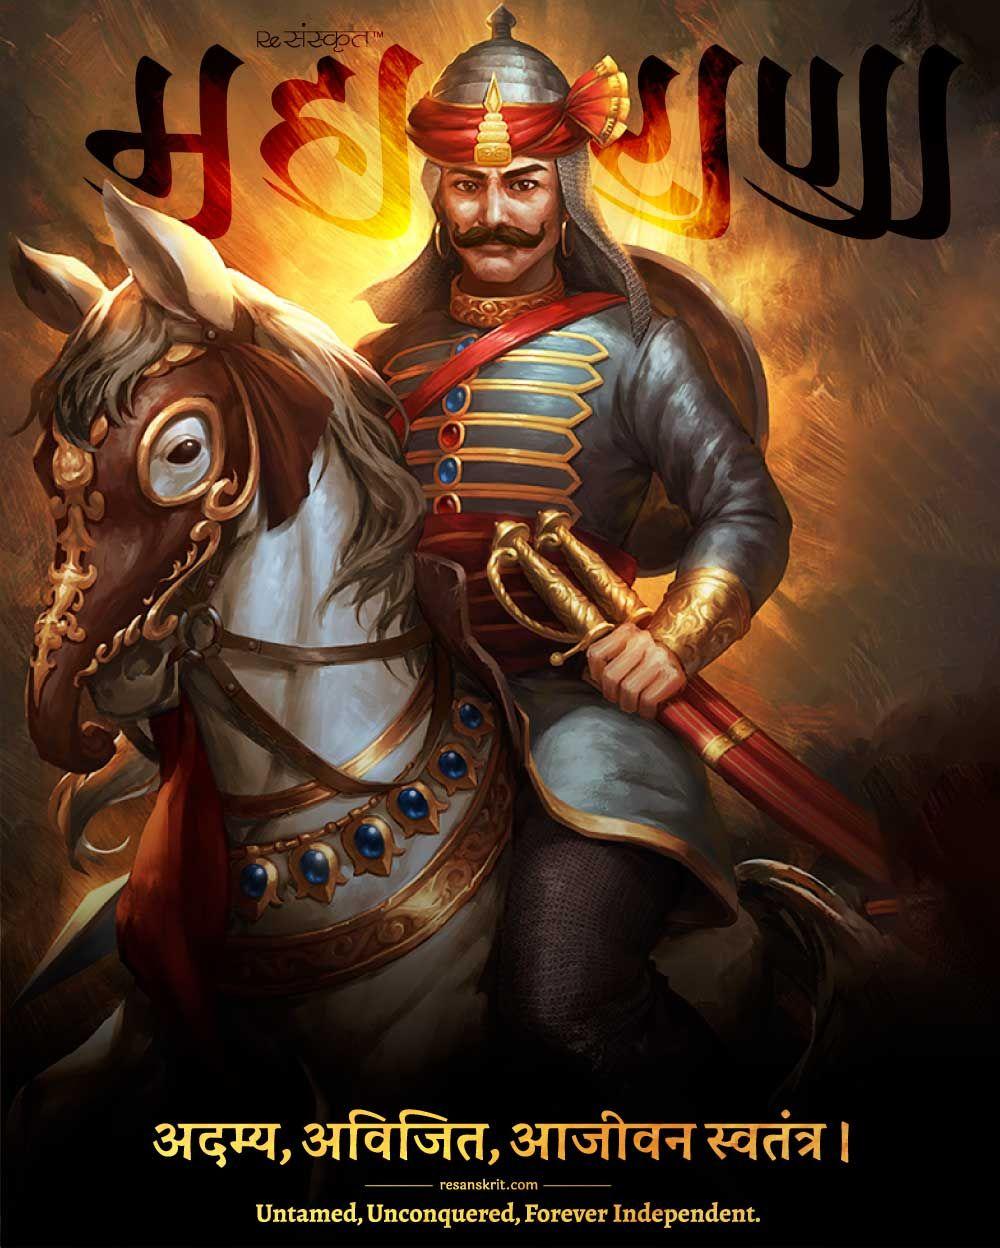 Happy Maharana Pratap Jayanti 2014 HD Wallpapers, Images ... |Maharana Pratap Wallpaper